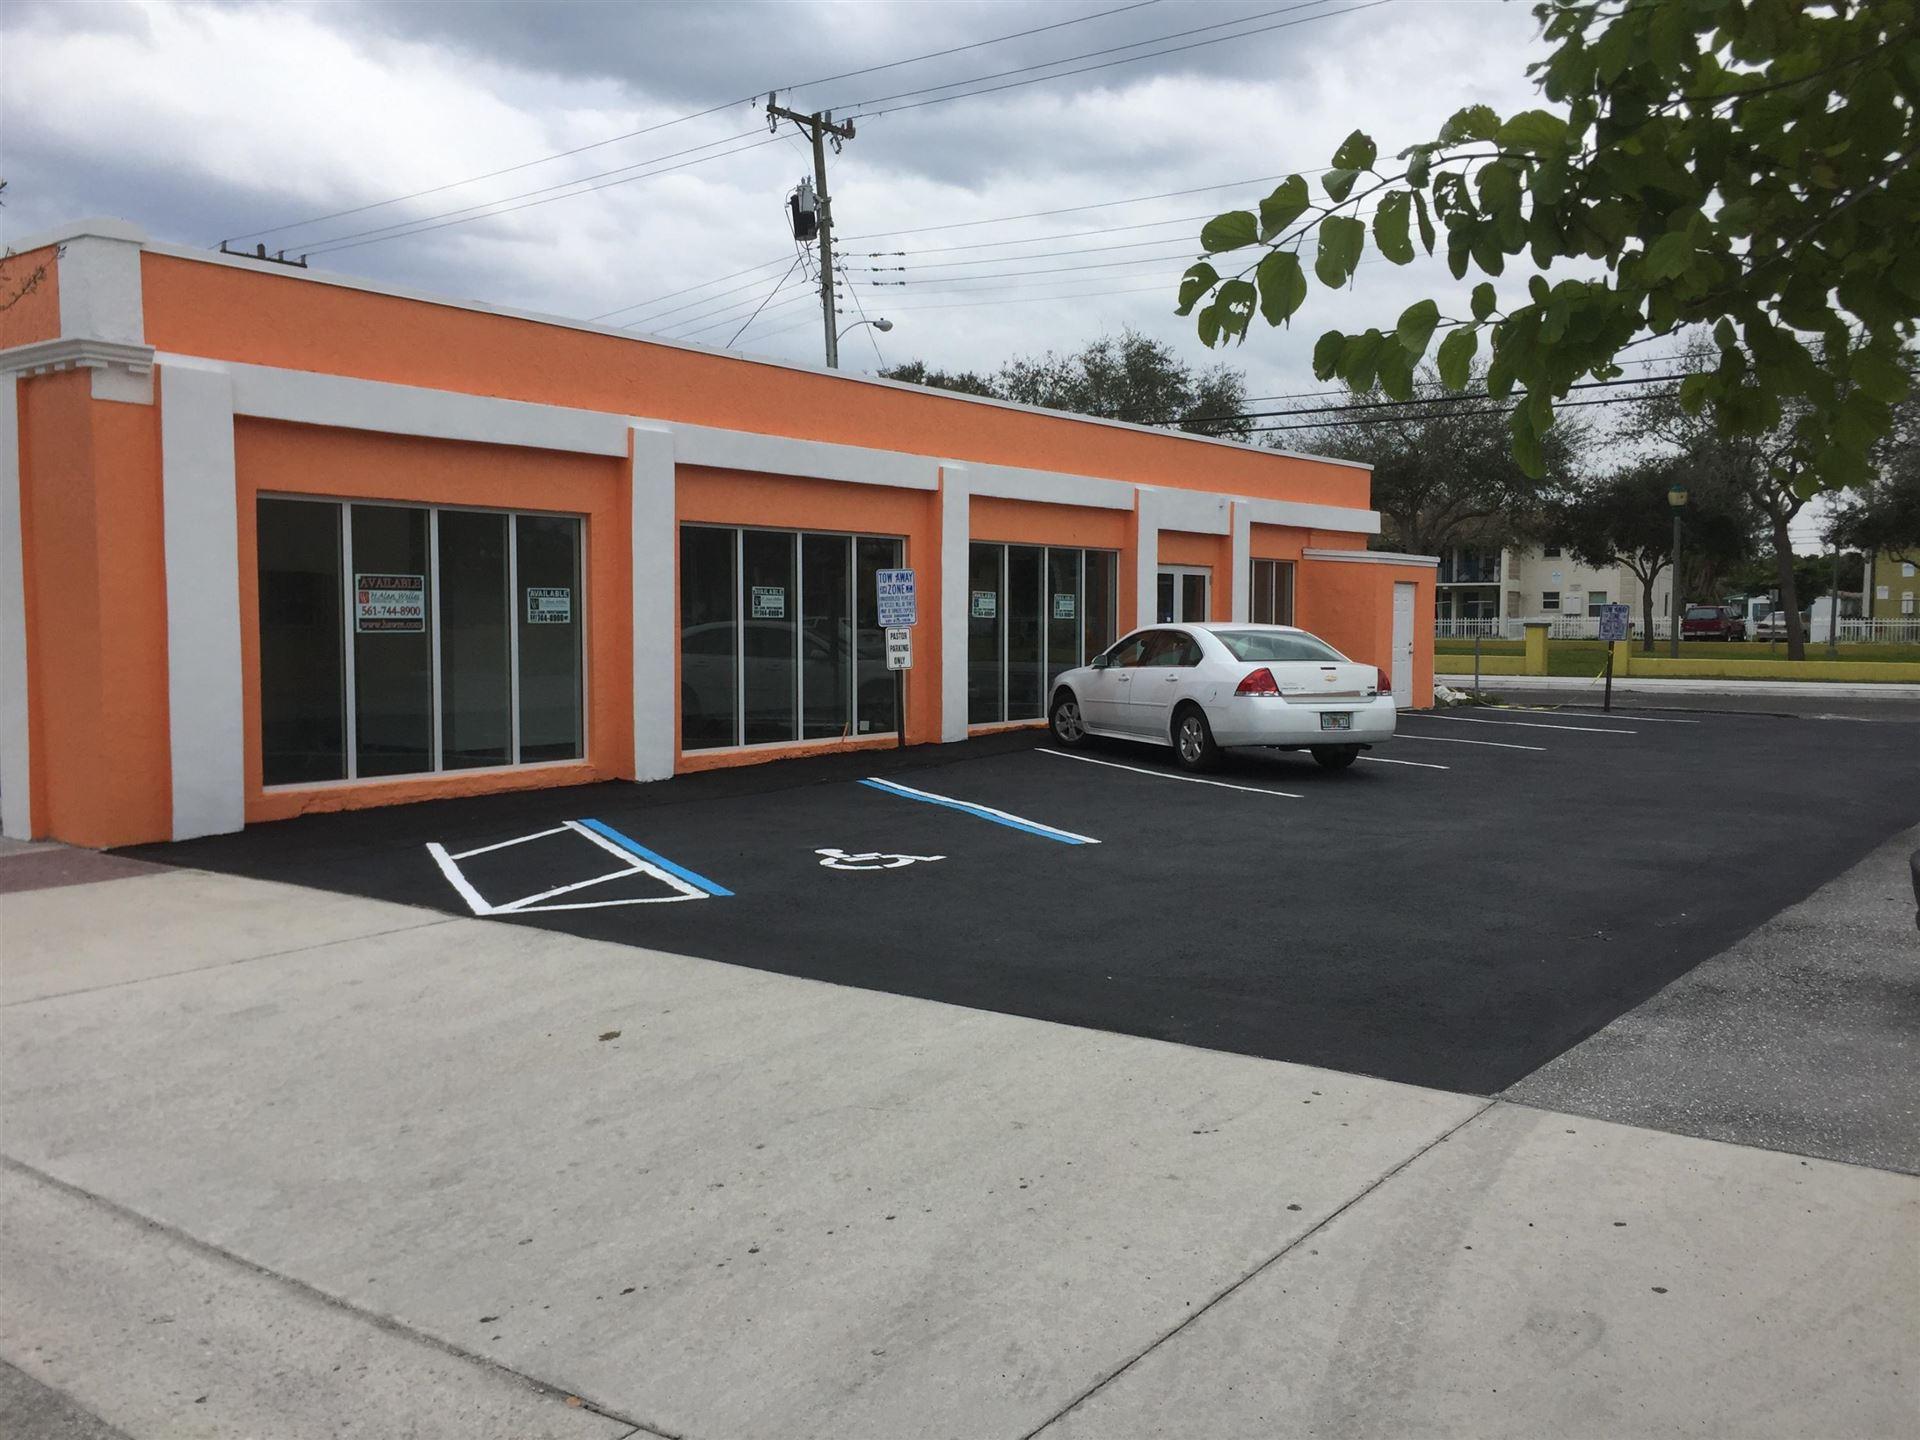 Photo of 526 Northwood Road, West Palm Beach, FL 33407 (MLS # RX-10627914)